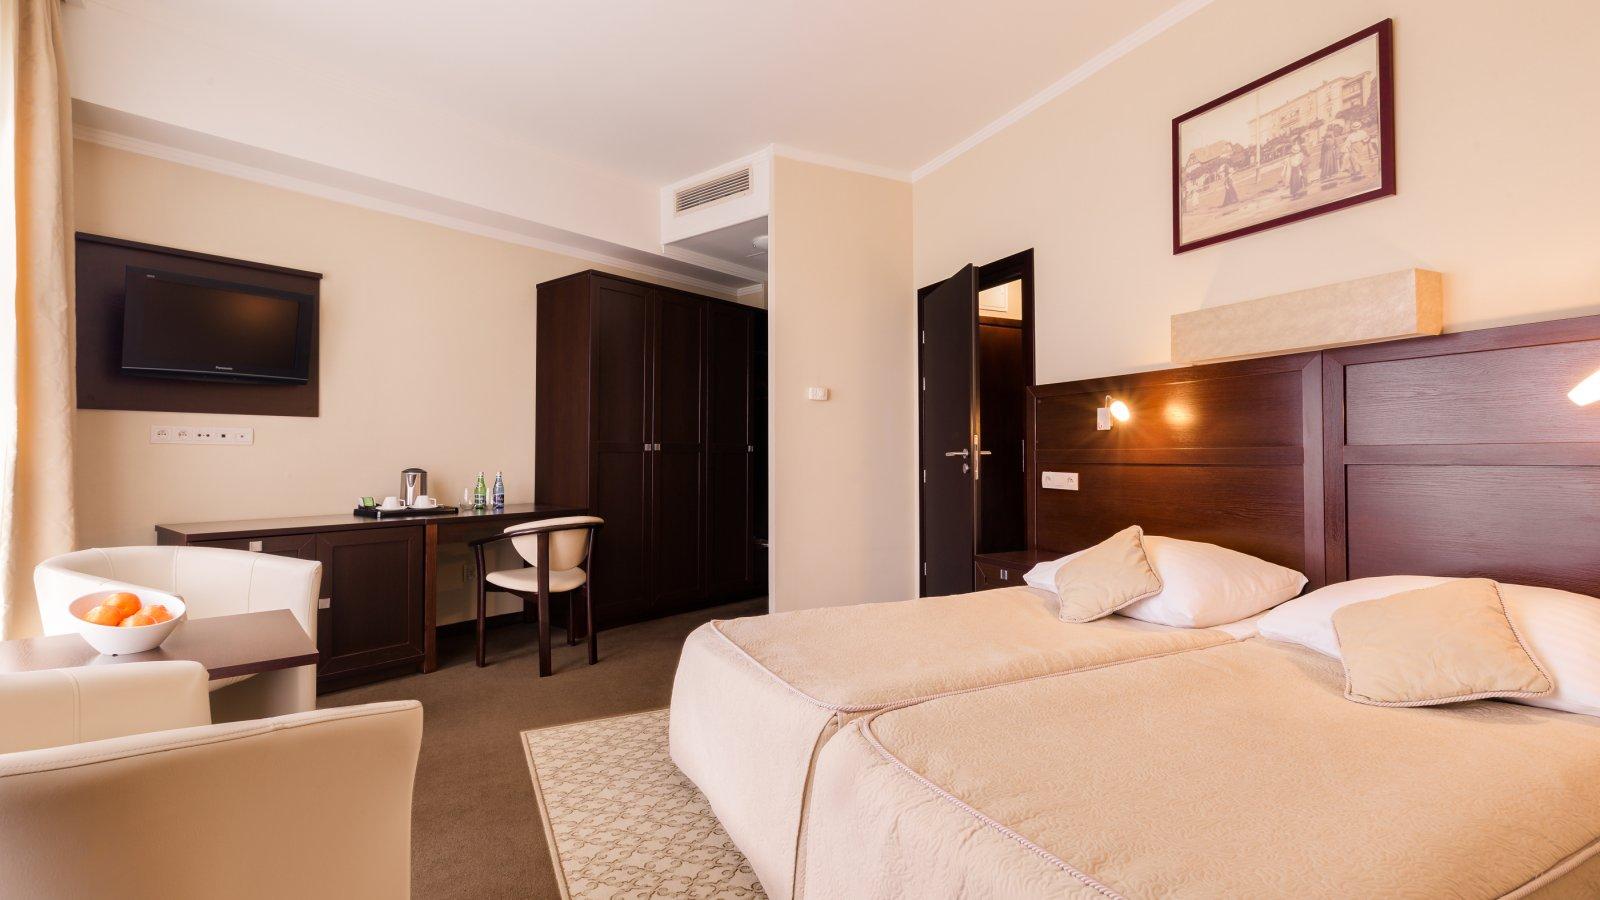 Hotell Aurora room-5